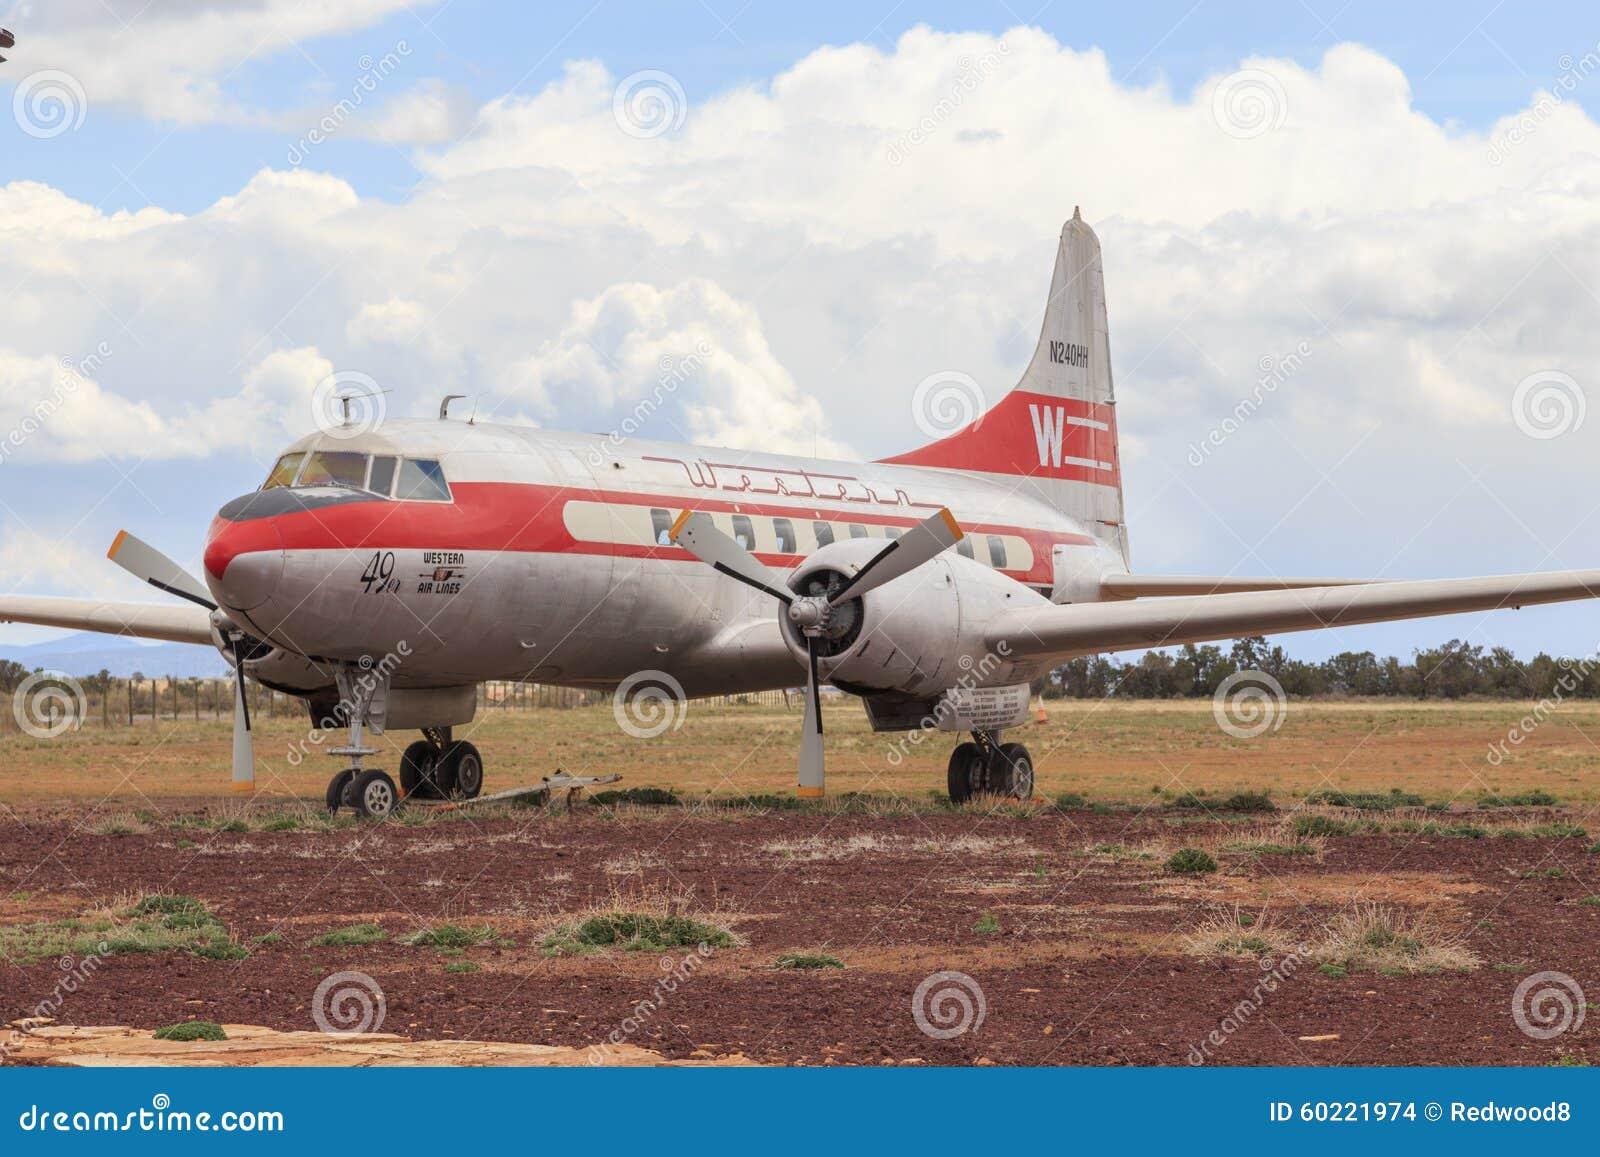 Vintage Convair 240 Western Airlines Passenger Airliner